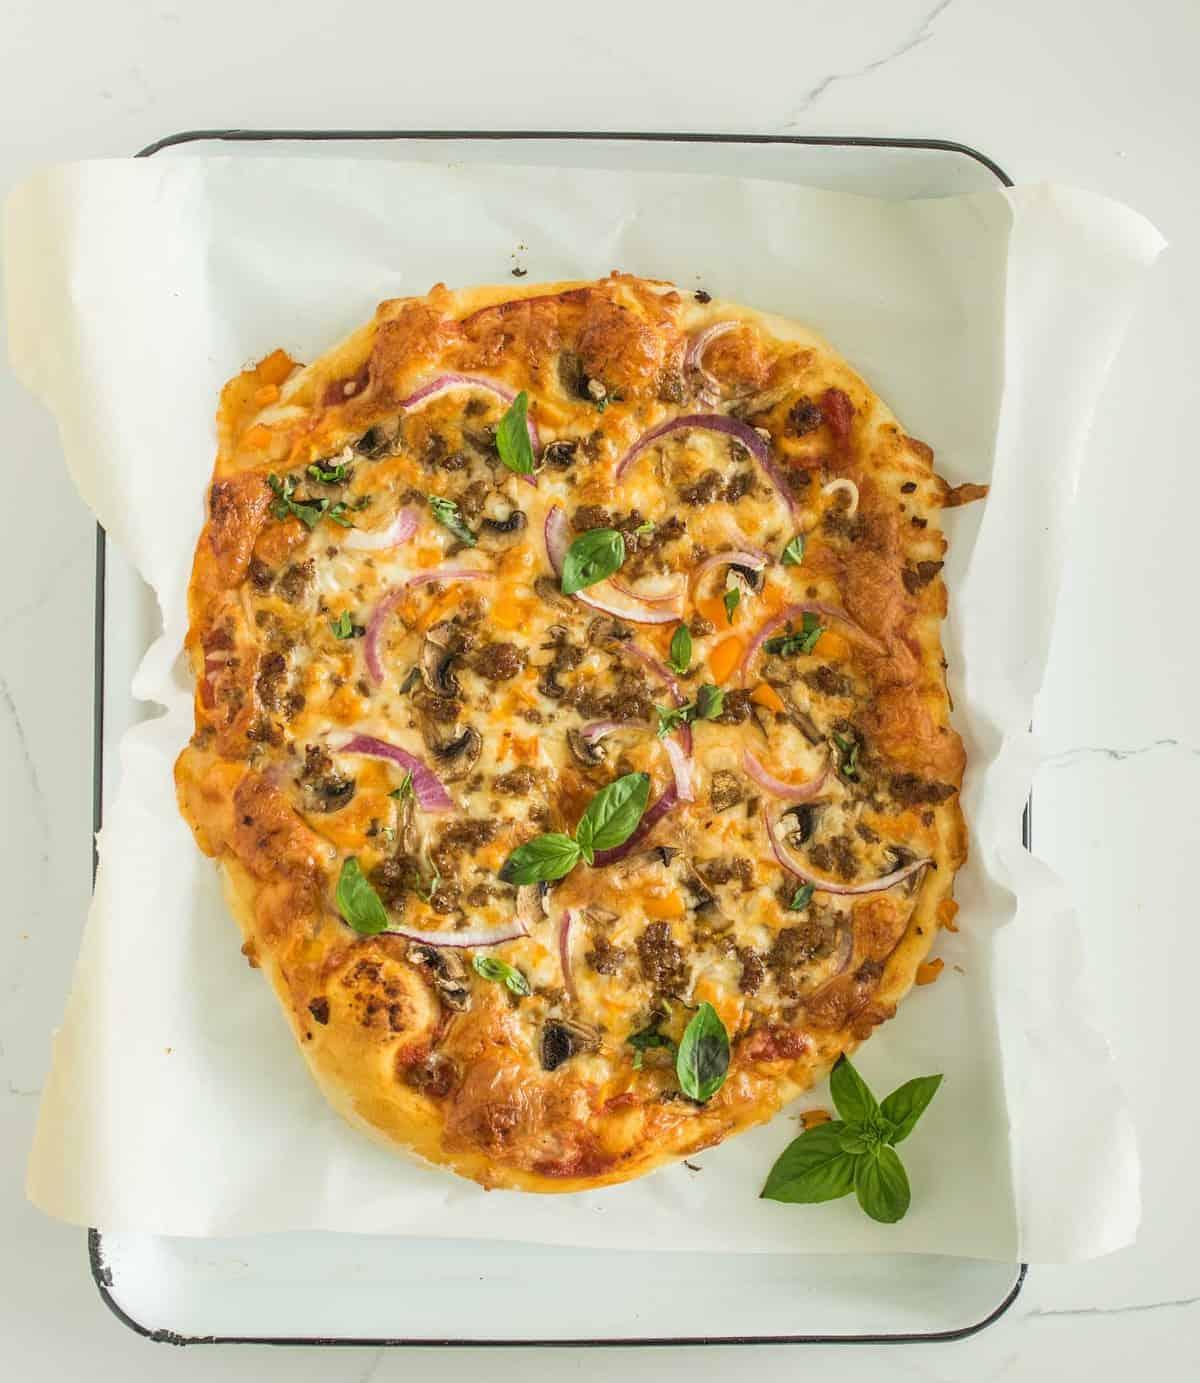 Image of homemade supreme pizza